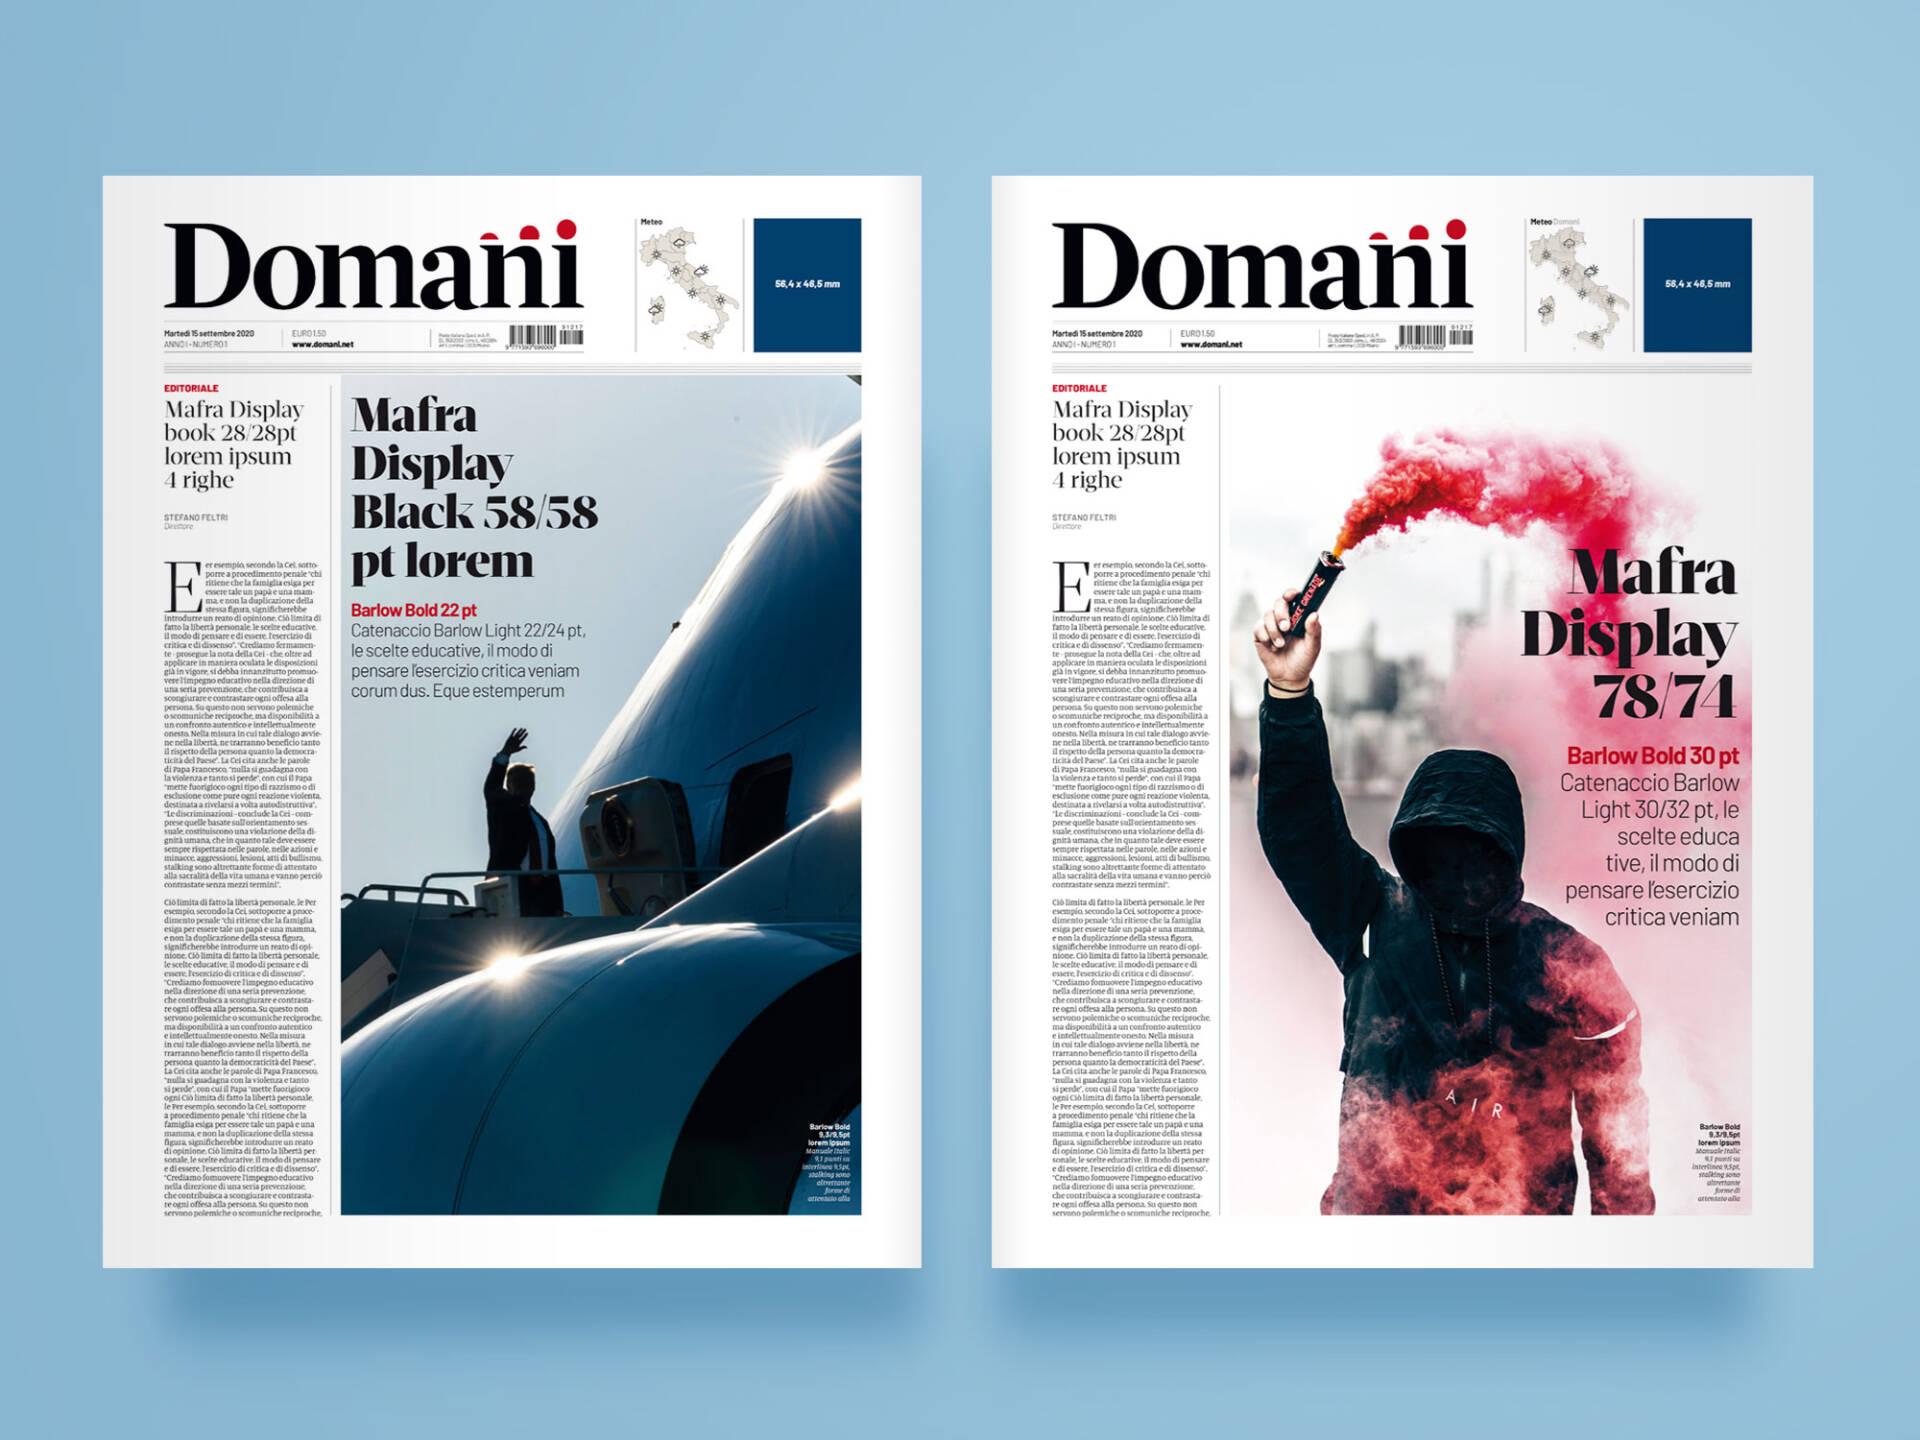 Domani_Print_Frontpage_Wenceslau_News_Design11